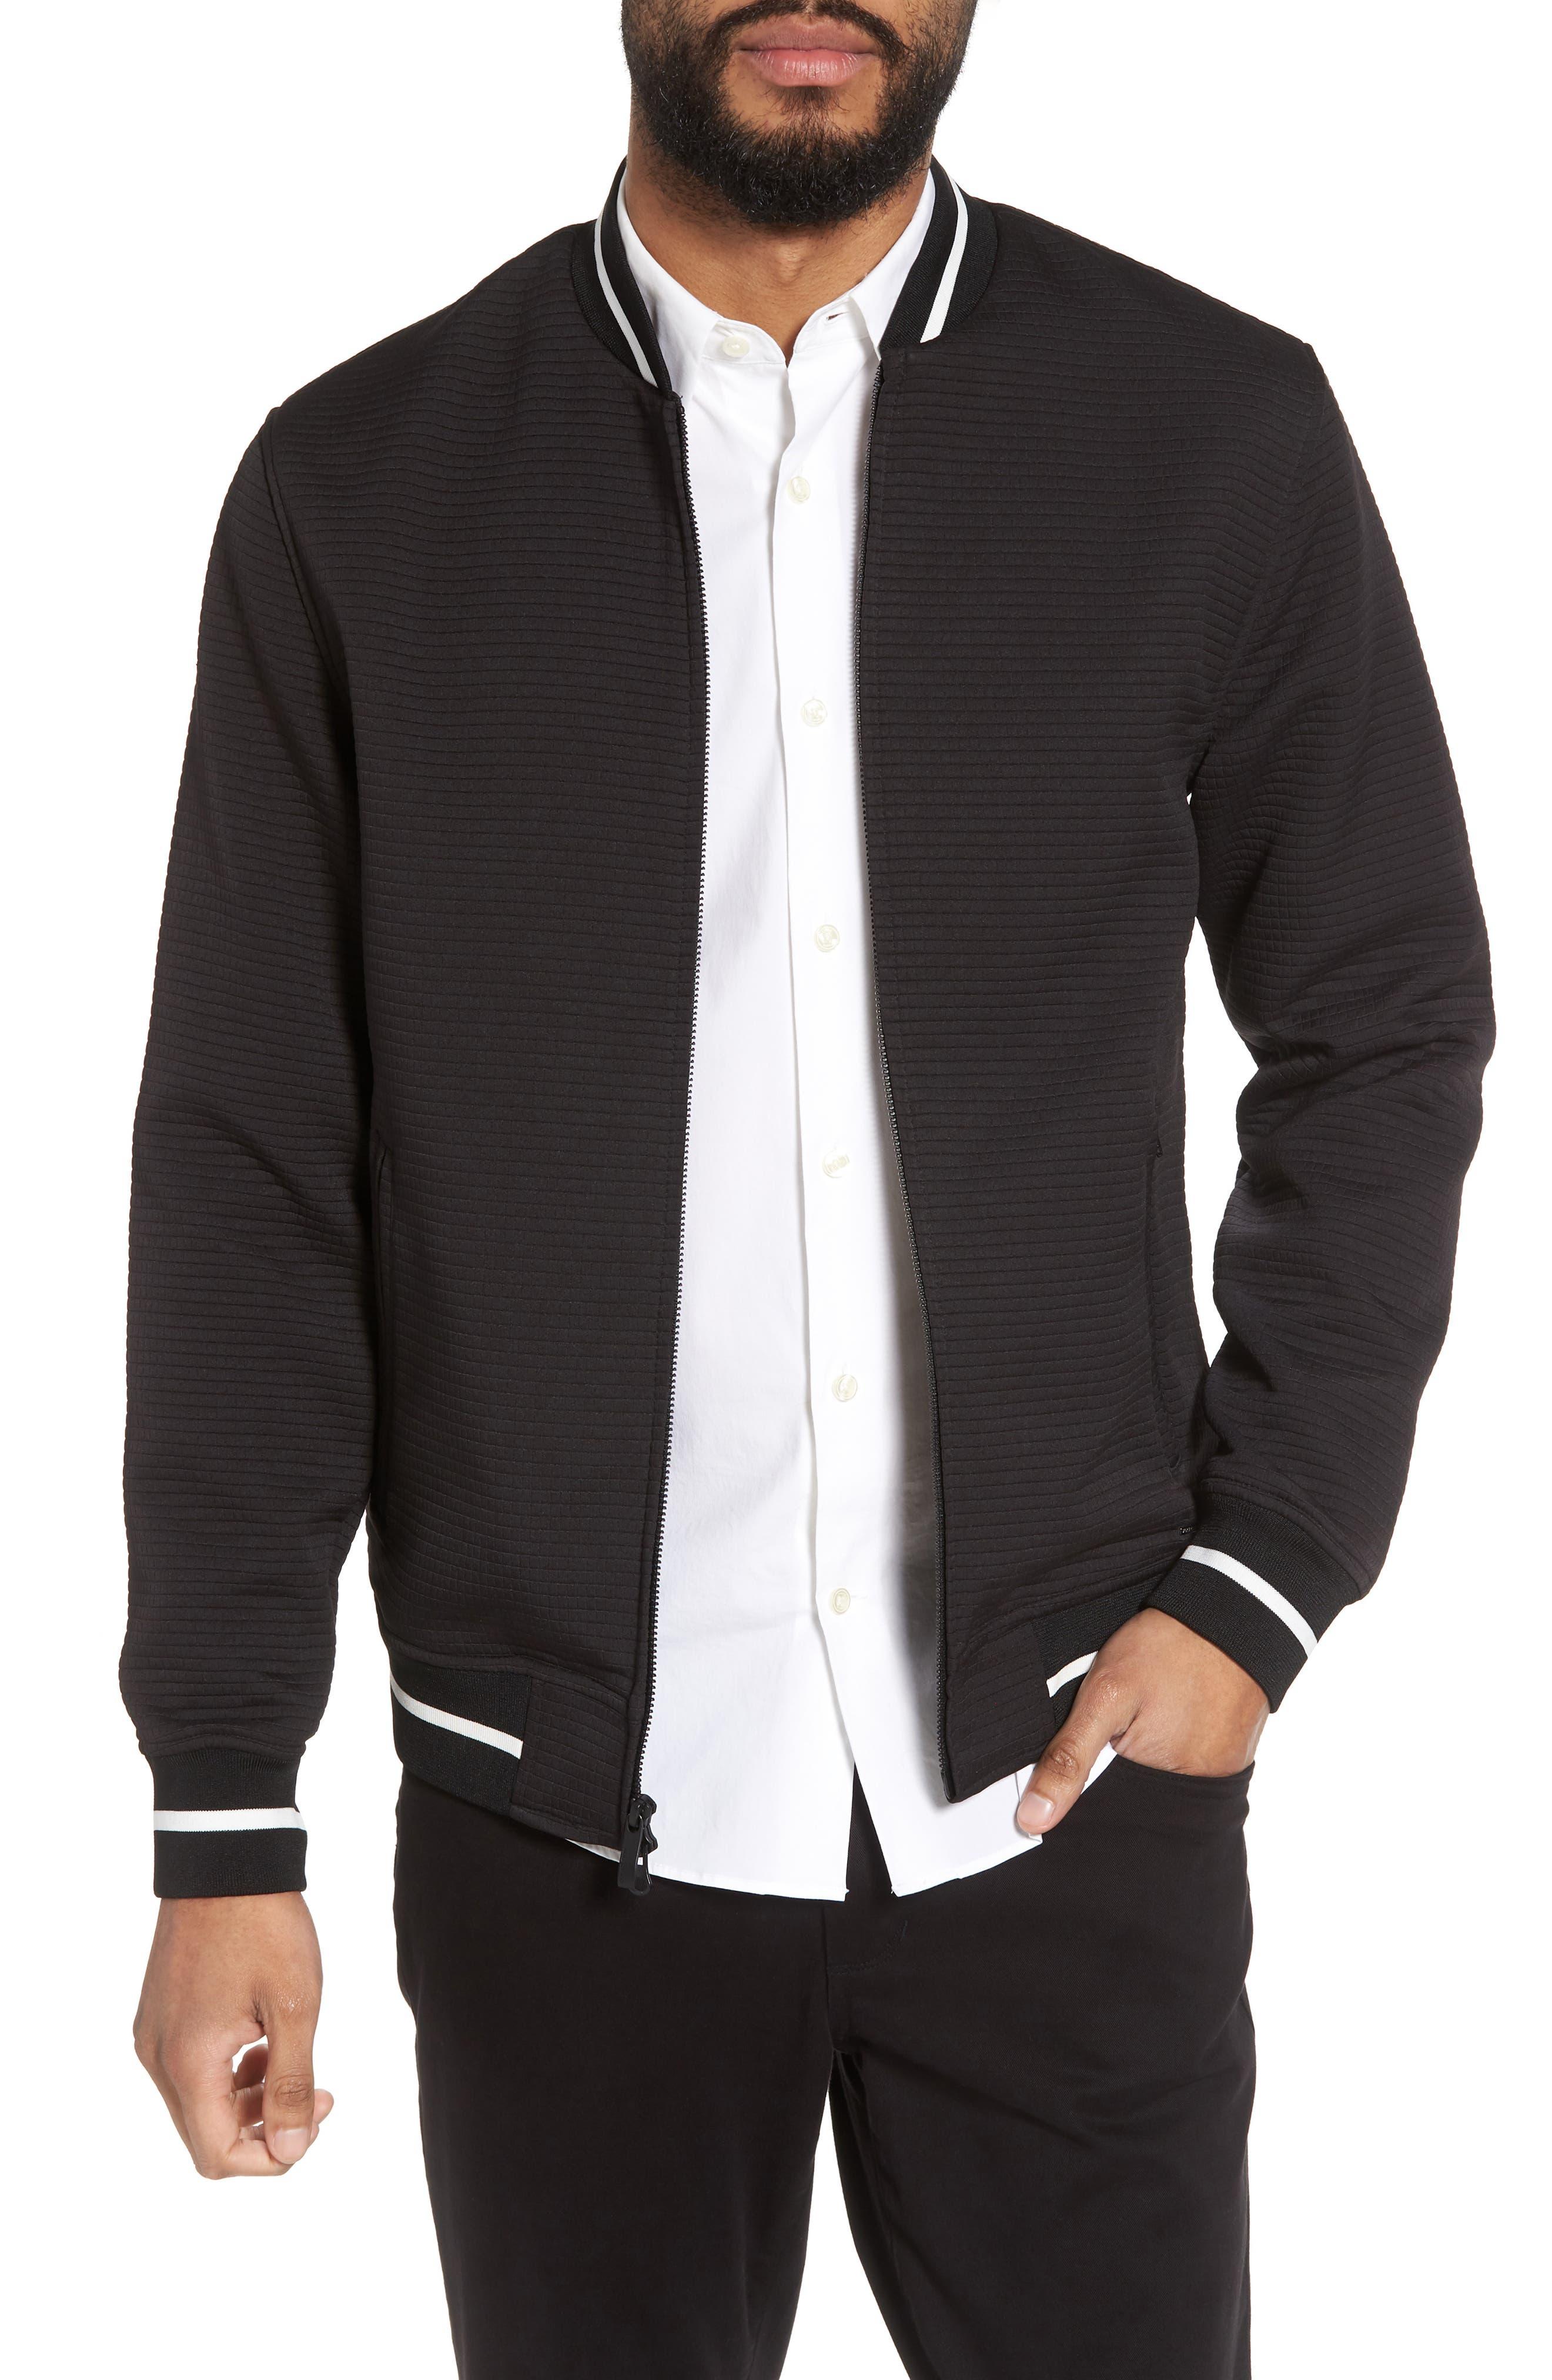 Slim Fit Bomber Jacket,                             Main thumbnail 1, color,                             Black Solid